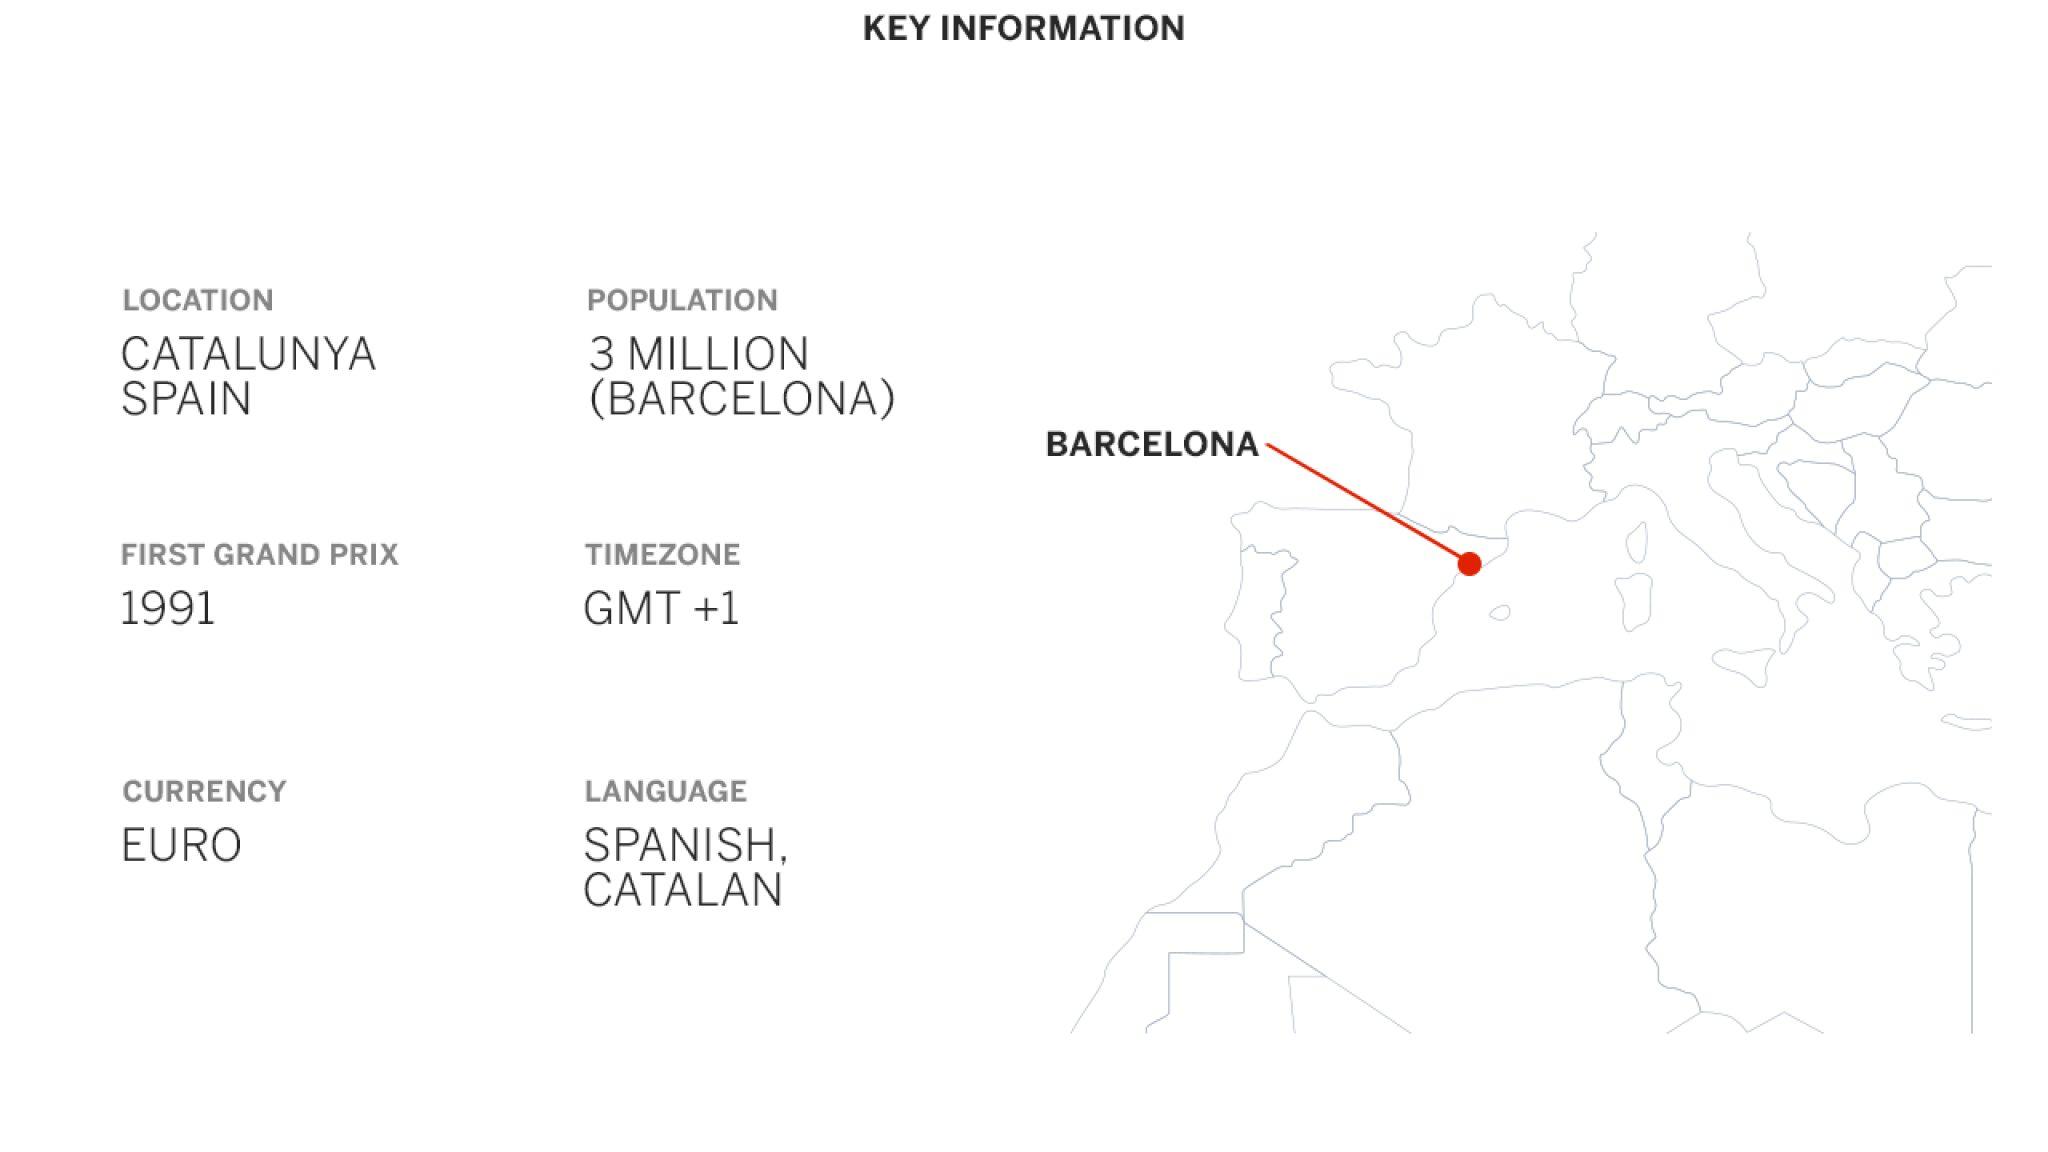 فرمول یک بارسلونا